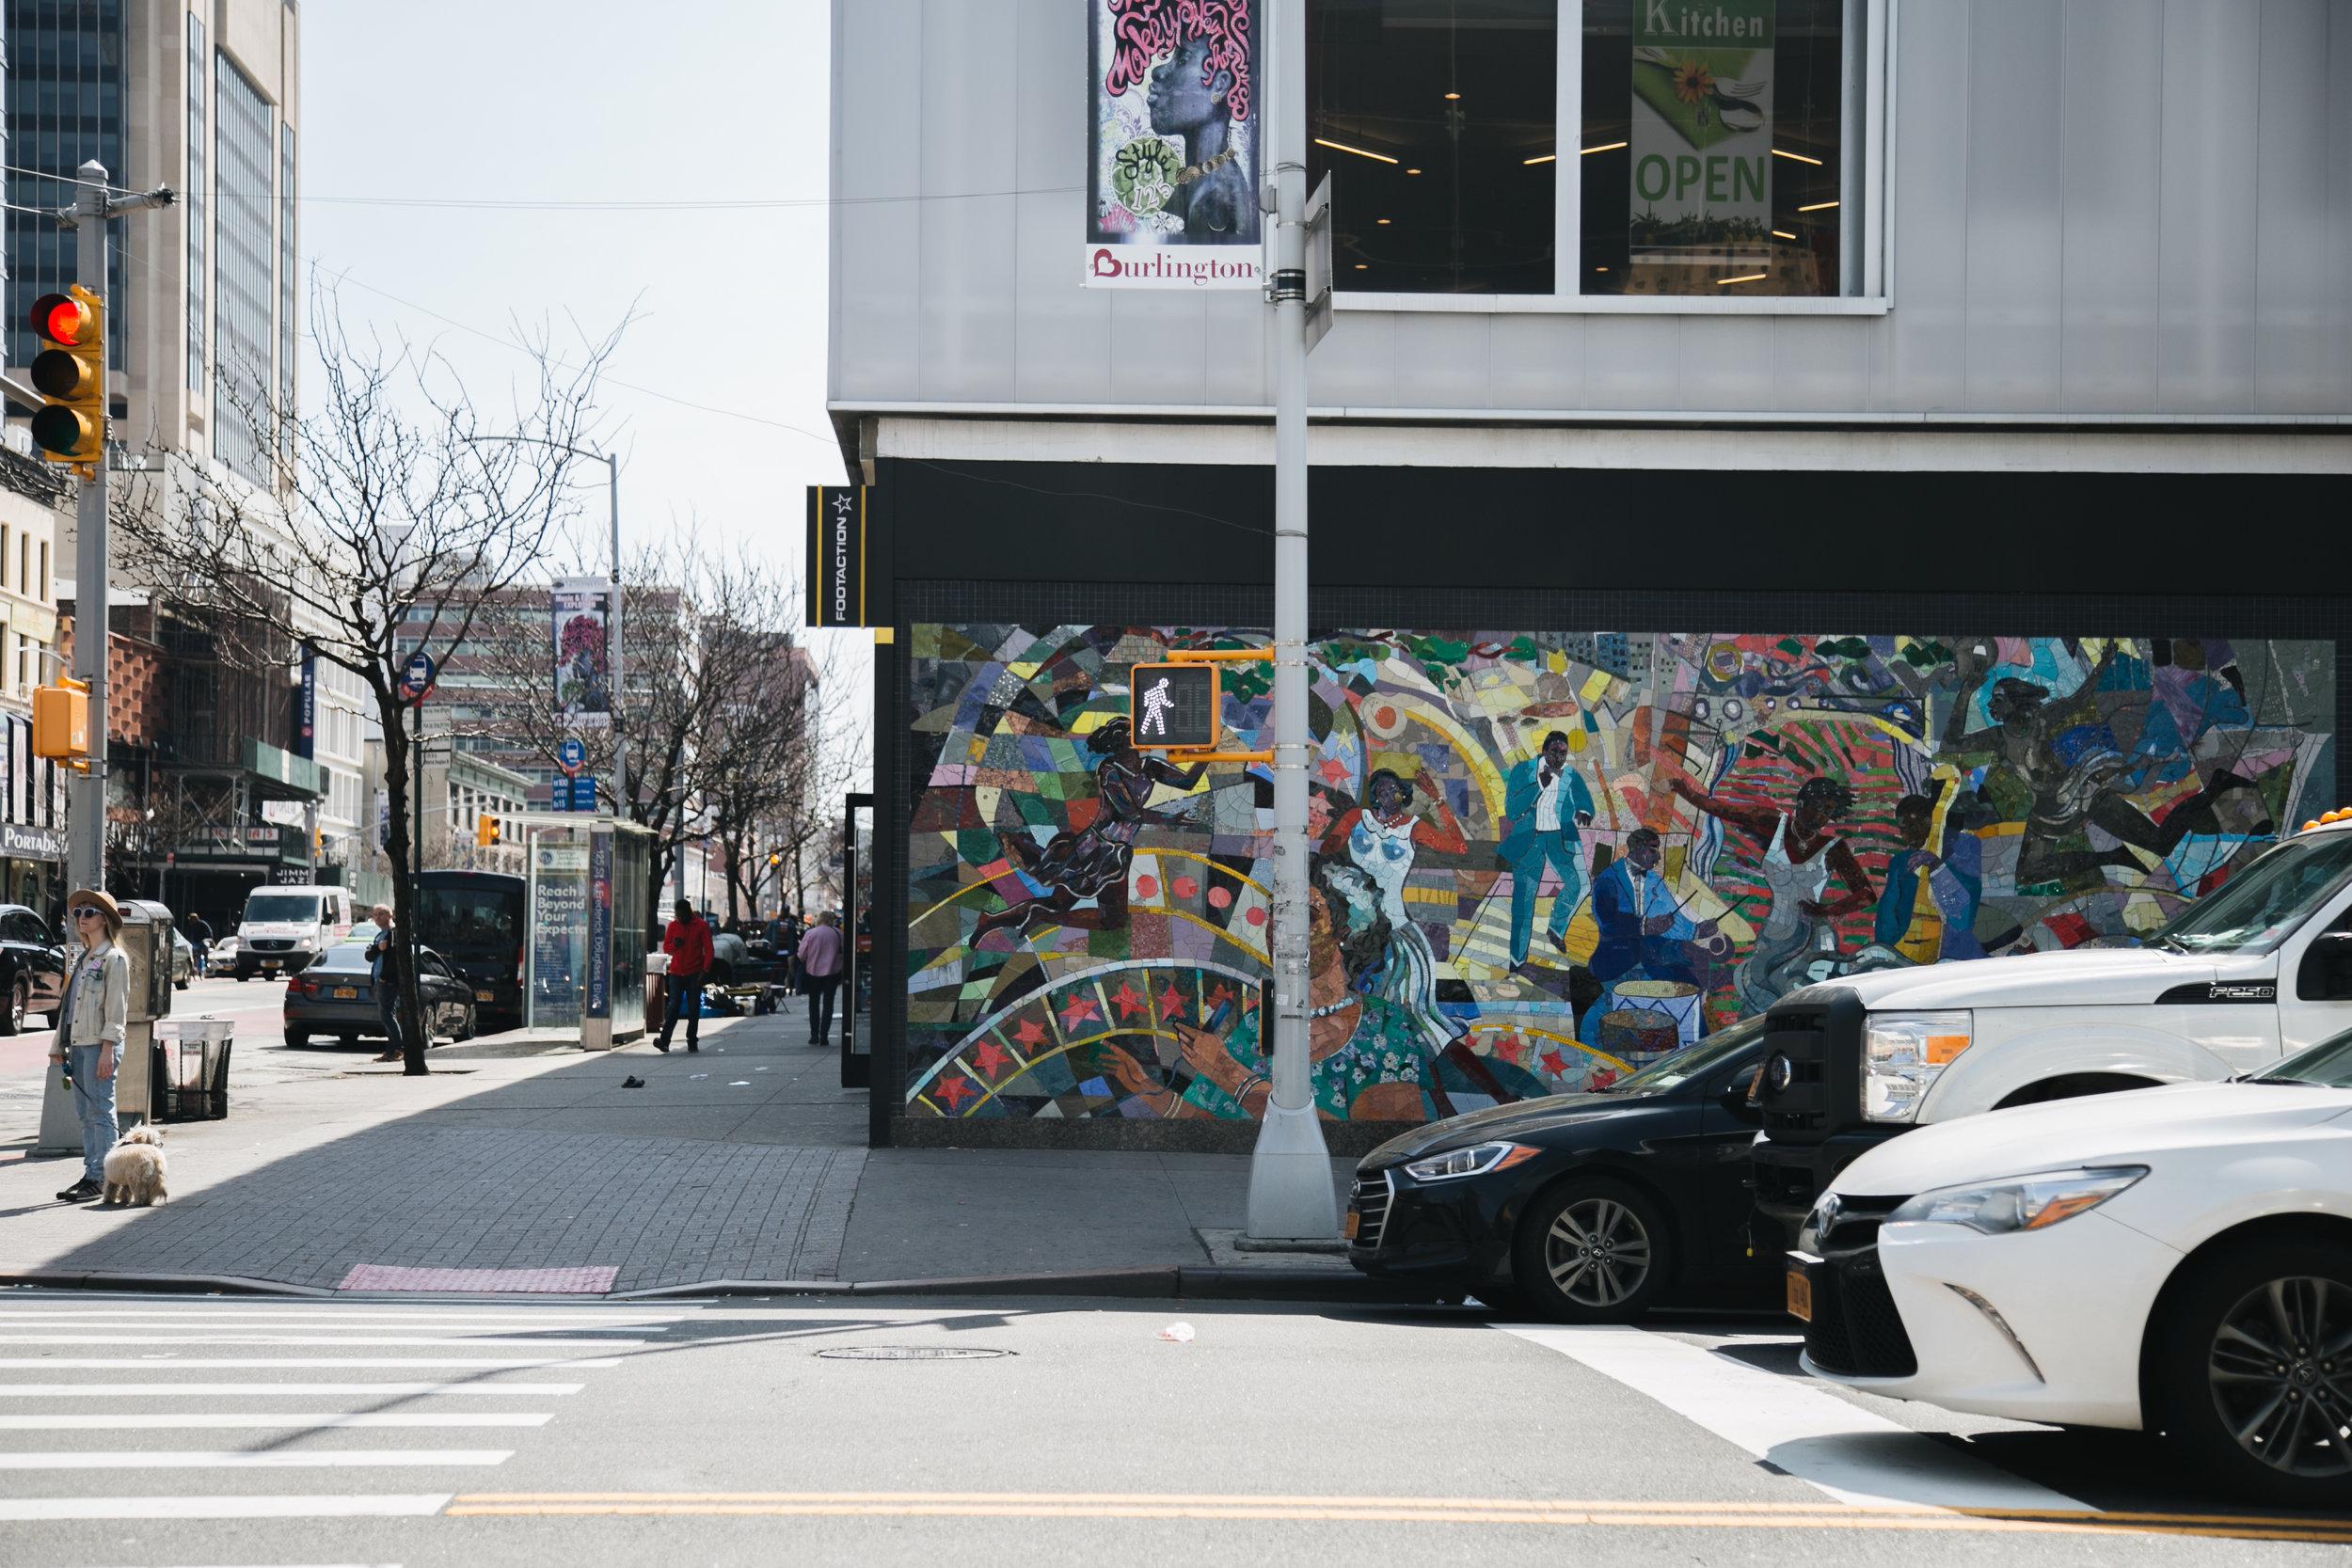 Harlem-streetart-blog-onmyway-newyork-city-guide.jpg